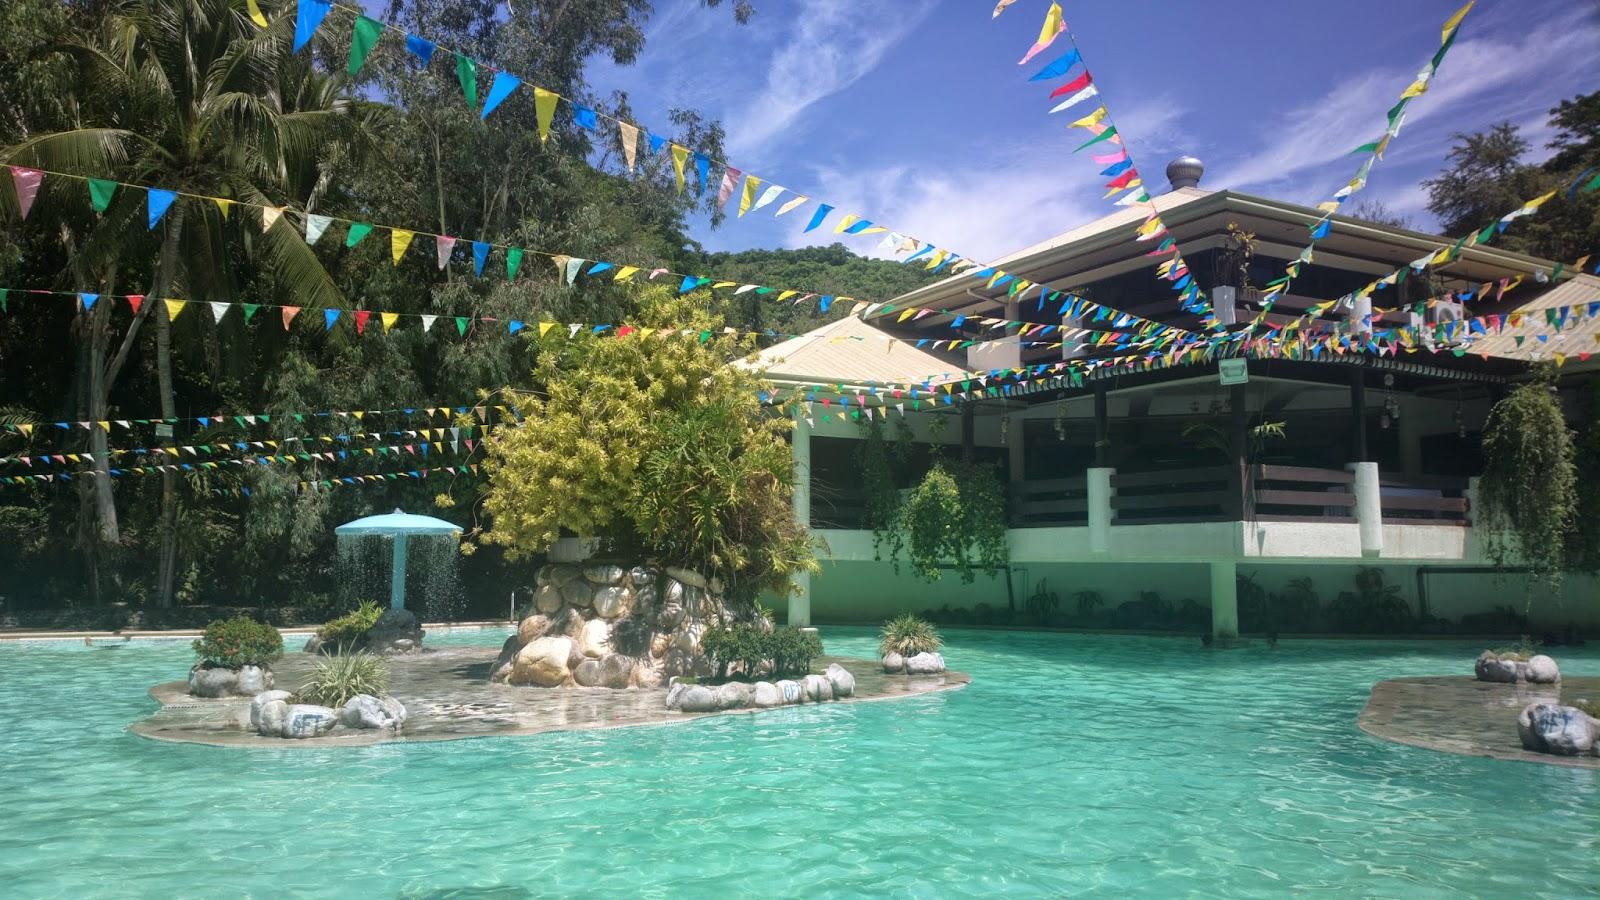 Lisland Rainforest Resort In Urdaneta City, Pangasinan